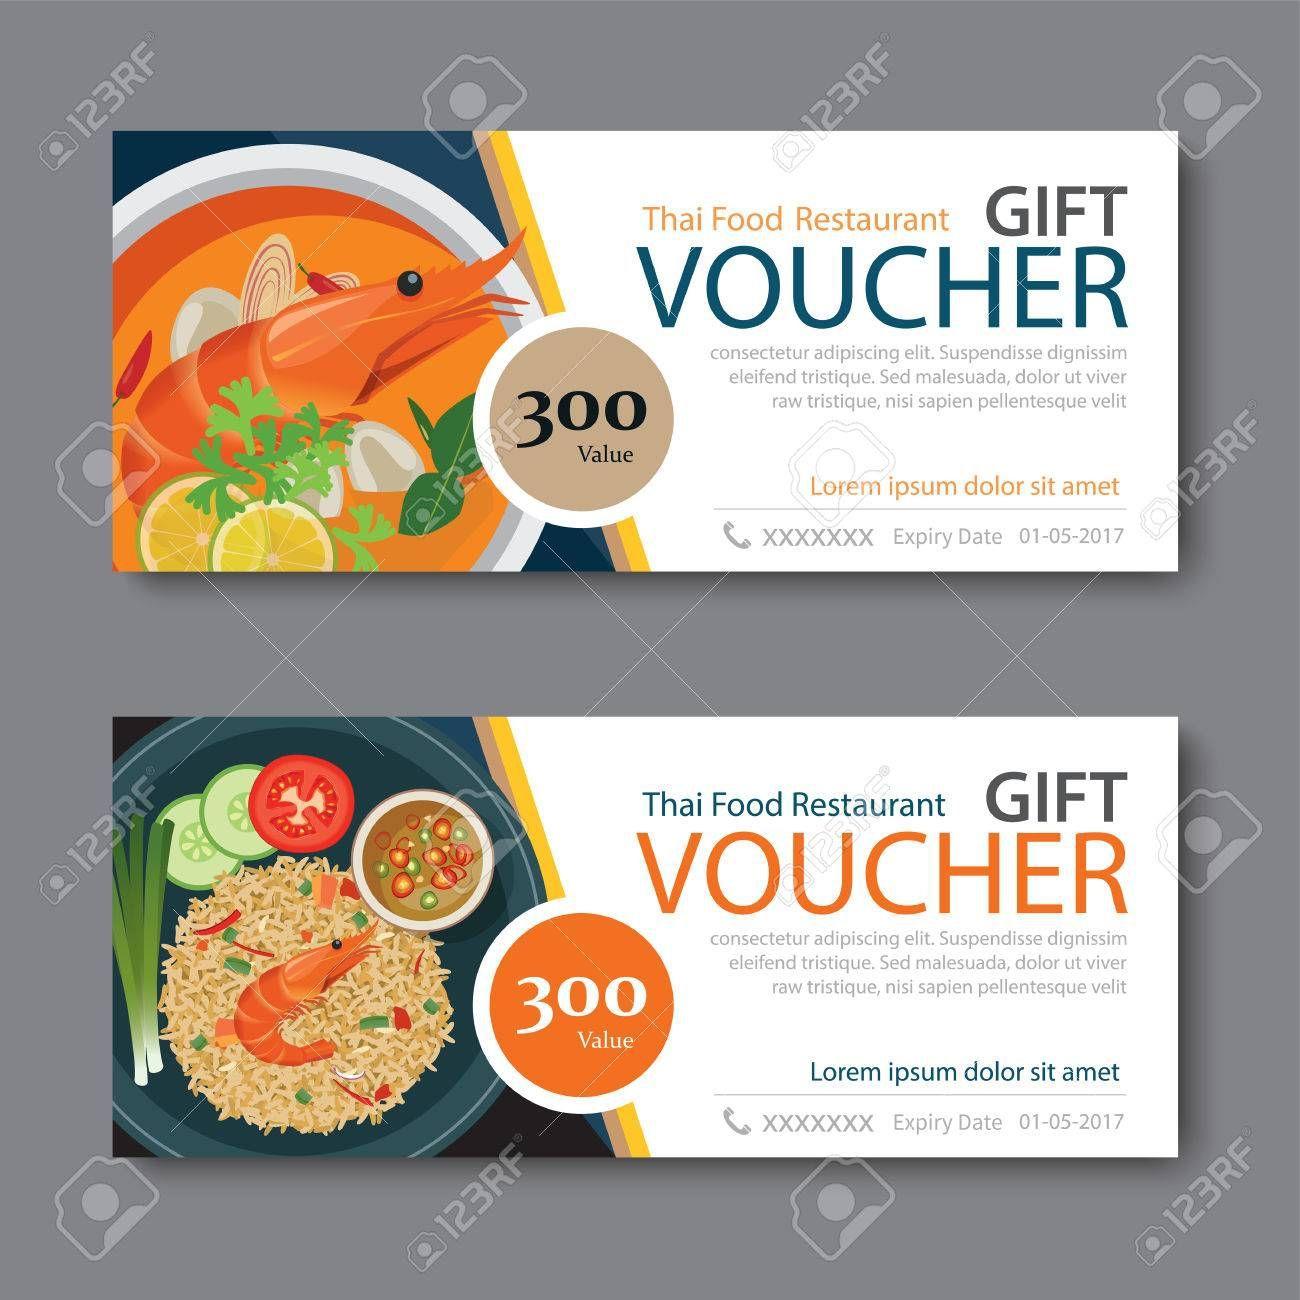 006 Remarkable Restaurant Gift Certificate Template Inspiration  Templates Card Word Voucher FreeFull